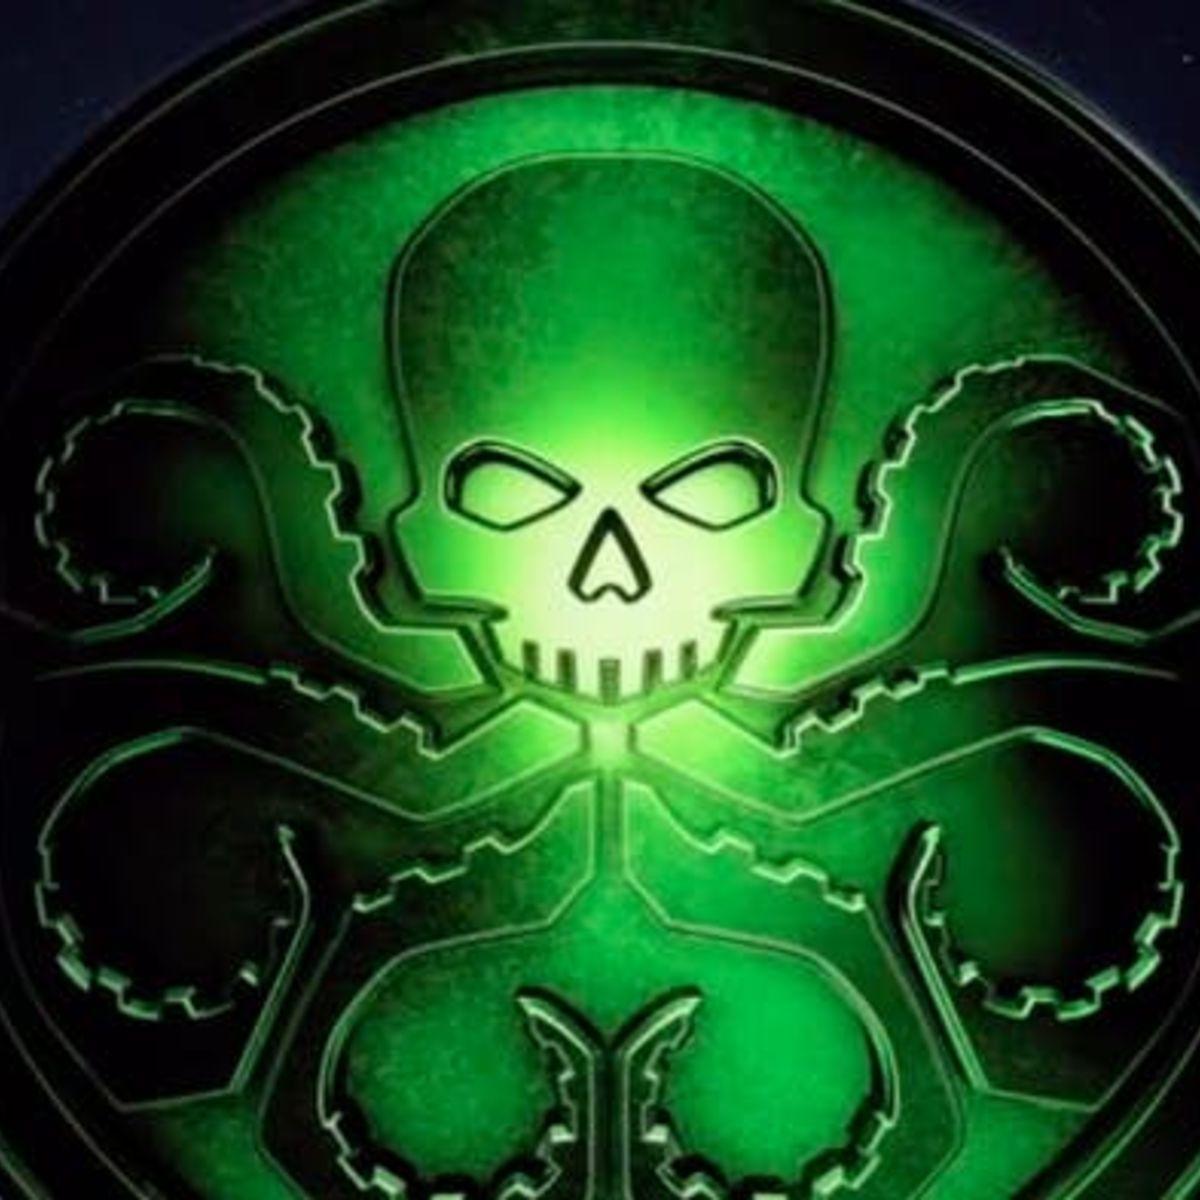 Agents-of-SHIELD-Hydra-Logo.jpg